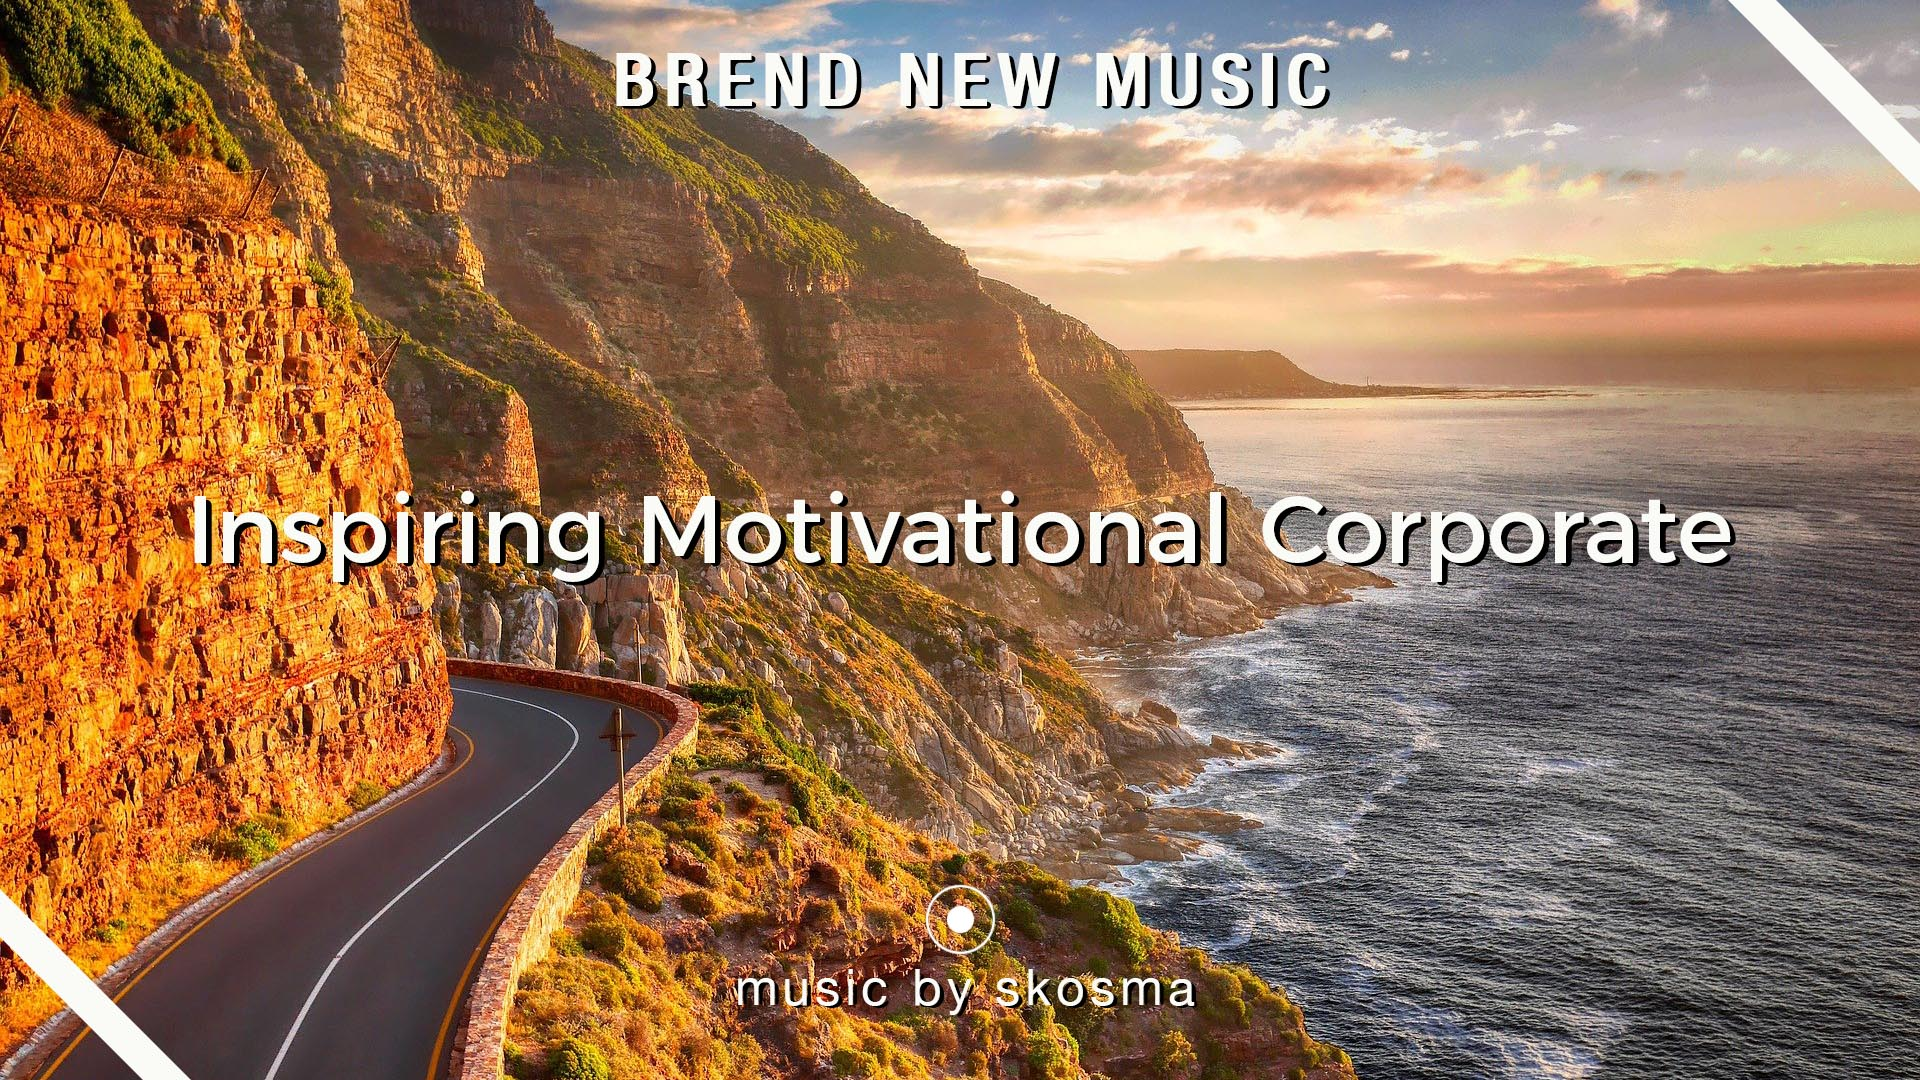 Inspiring Motivational Corporate Pack - 1